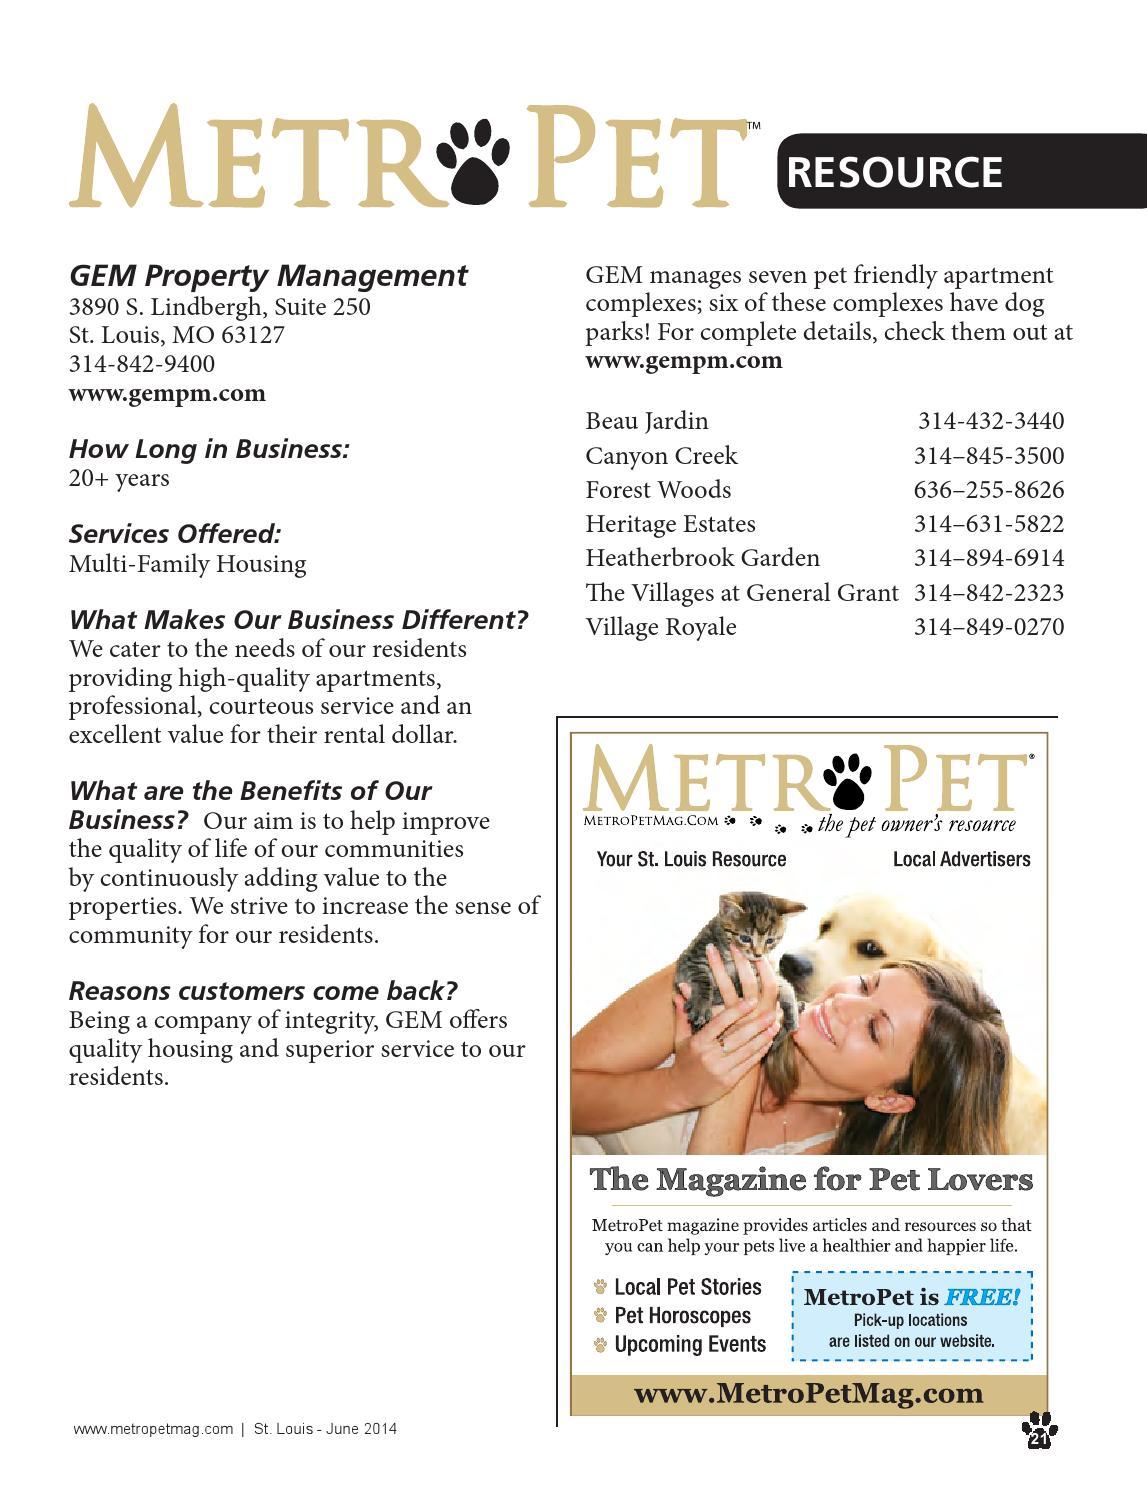 Metropet stl june14 web by ROI Marketing - issuu